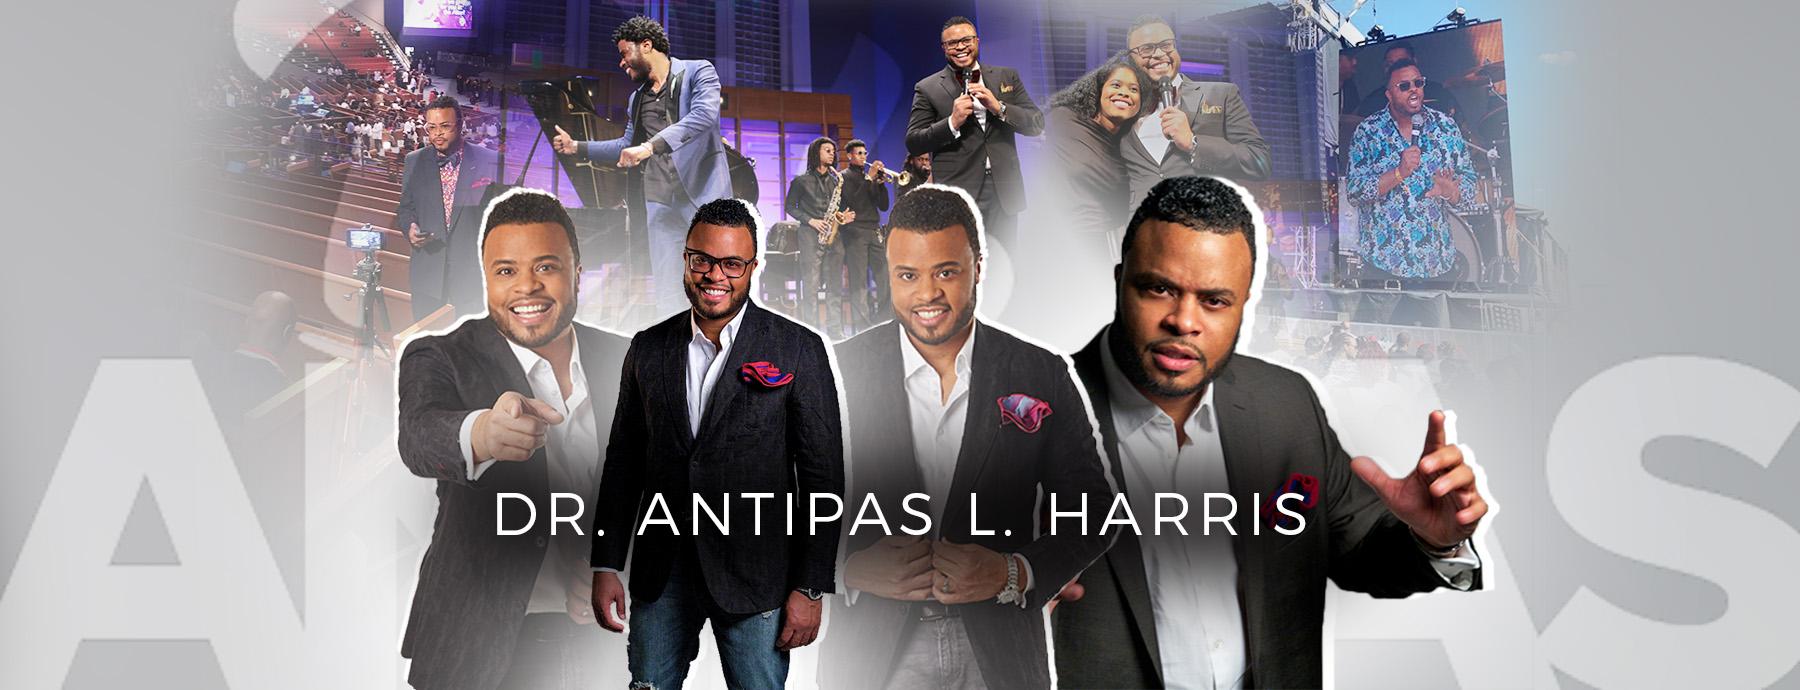 Collage of Antipas Harris Photos